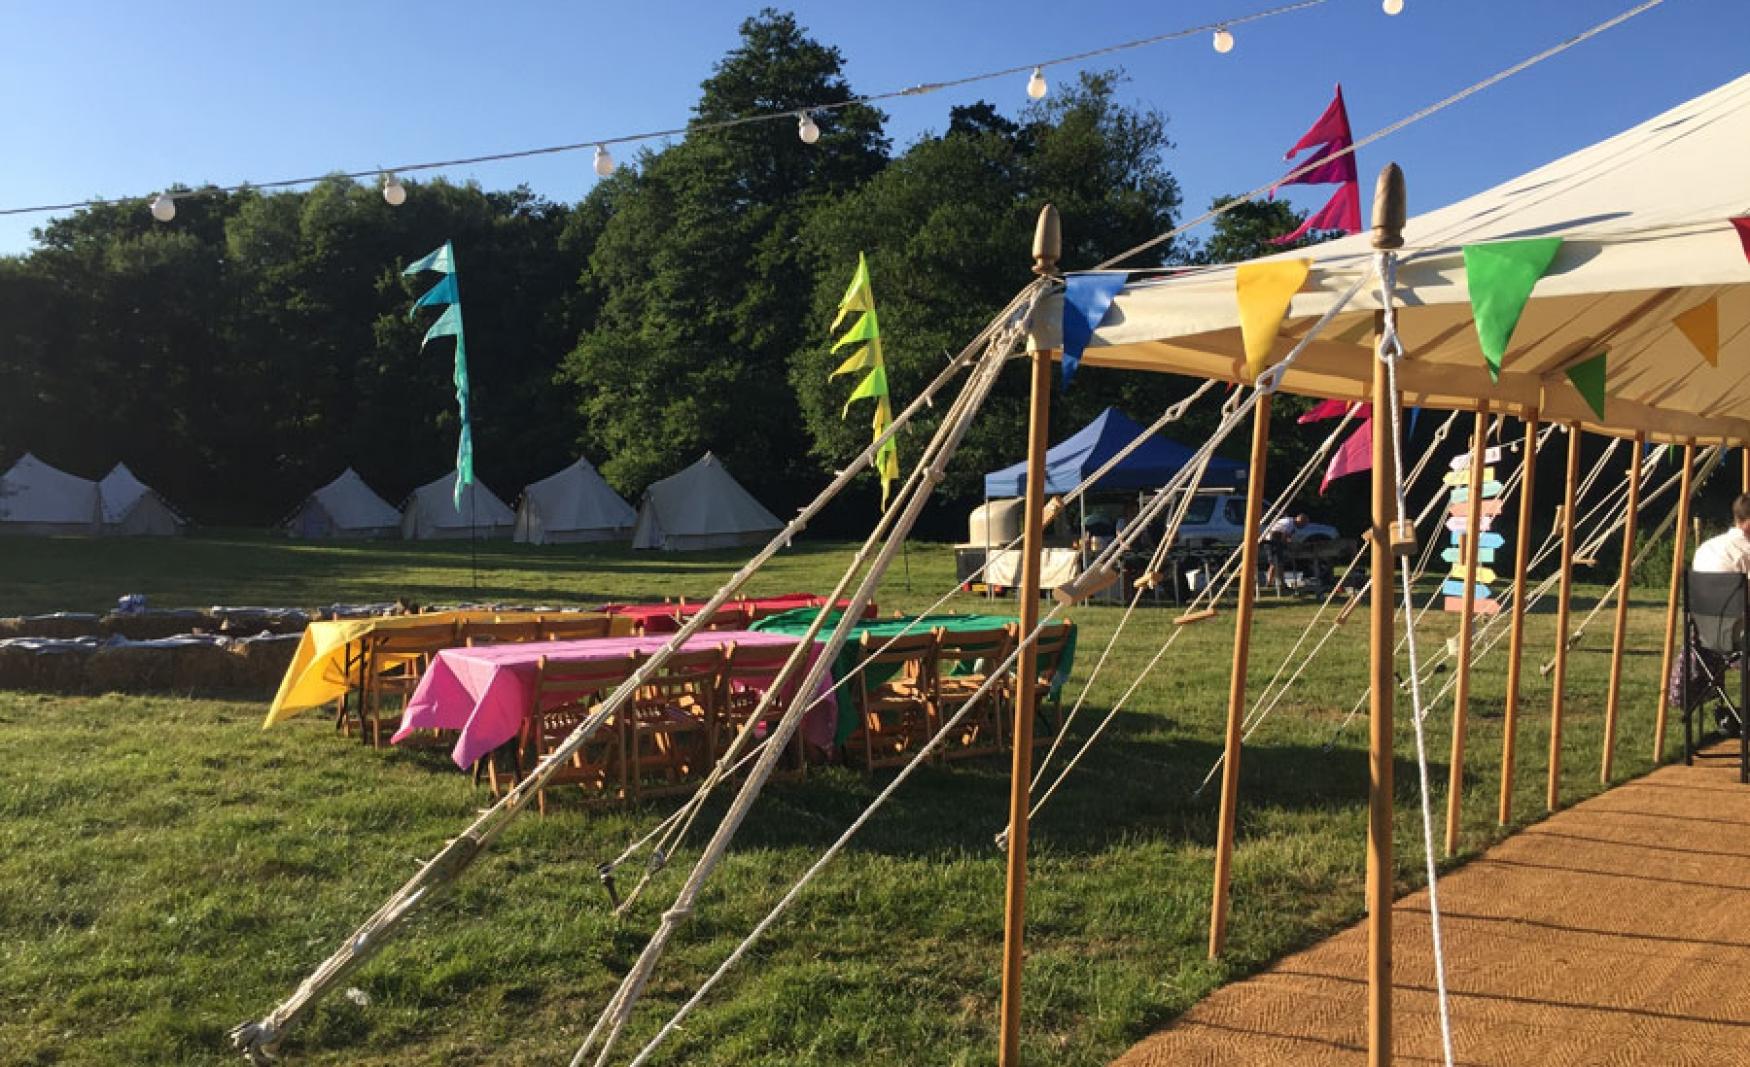 fiesta-fields-outdoor-wedding-events-company-tipi-surrey-sussex-eashing-farm-godalming-7